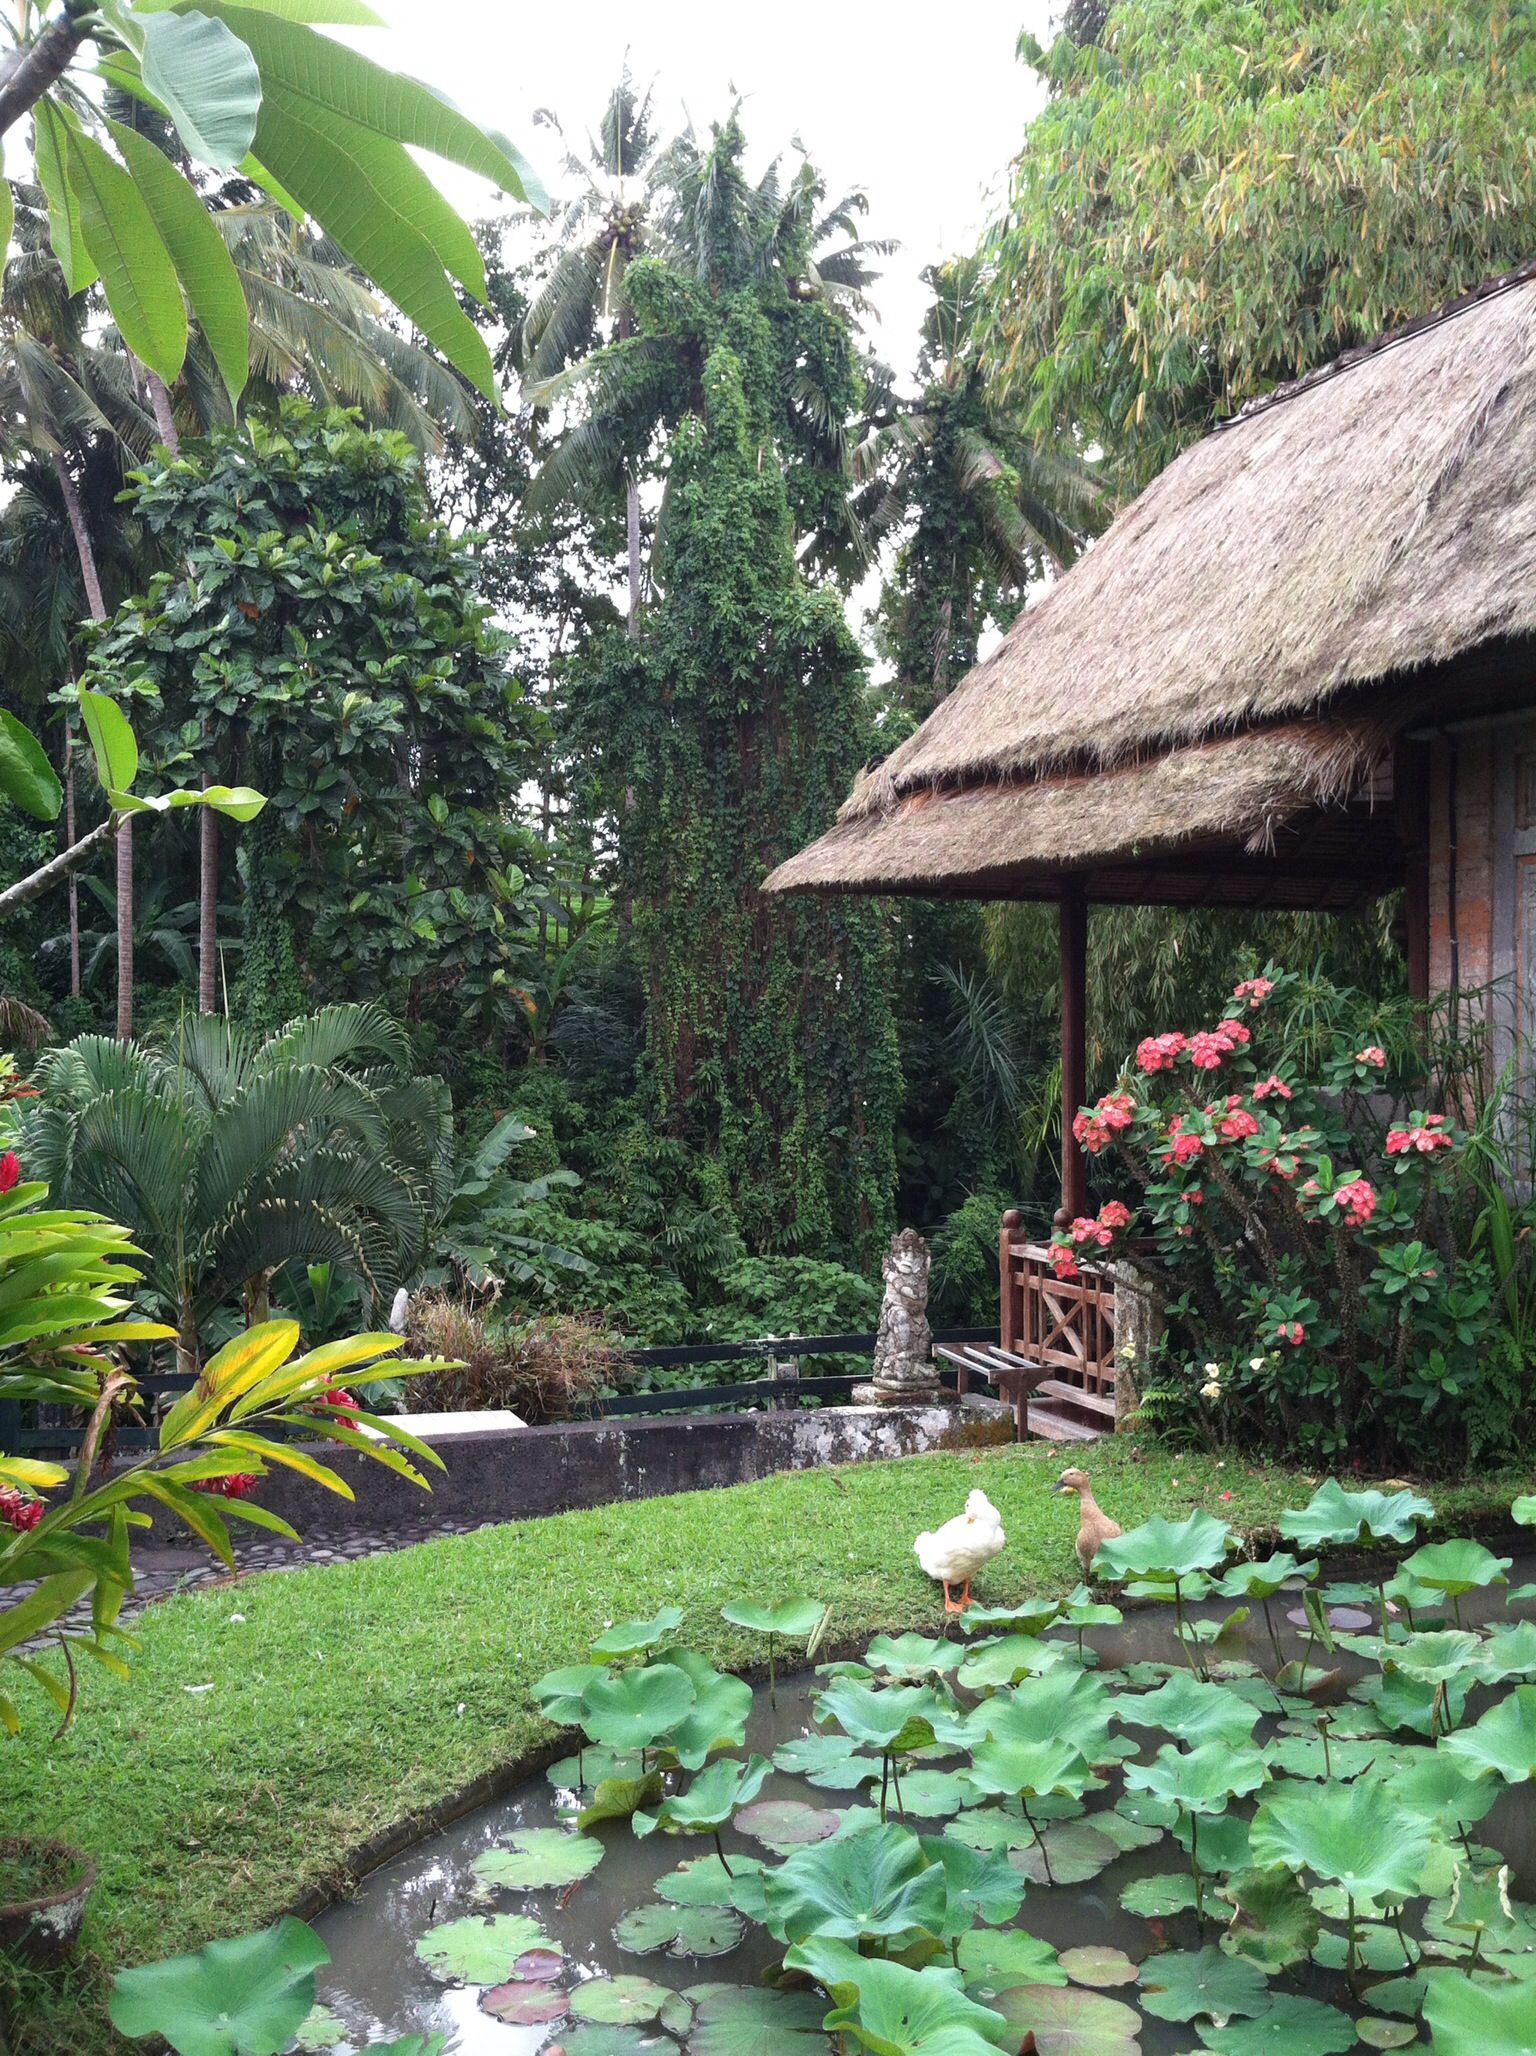 Restaurant garden in Ubud Bali | Beautiful Bali | Pinterest | Ubud ...